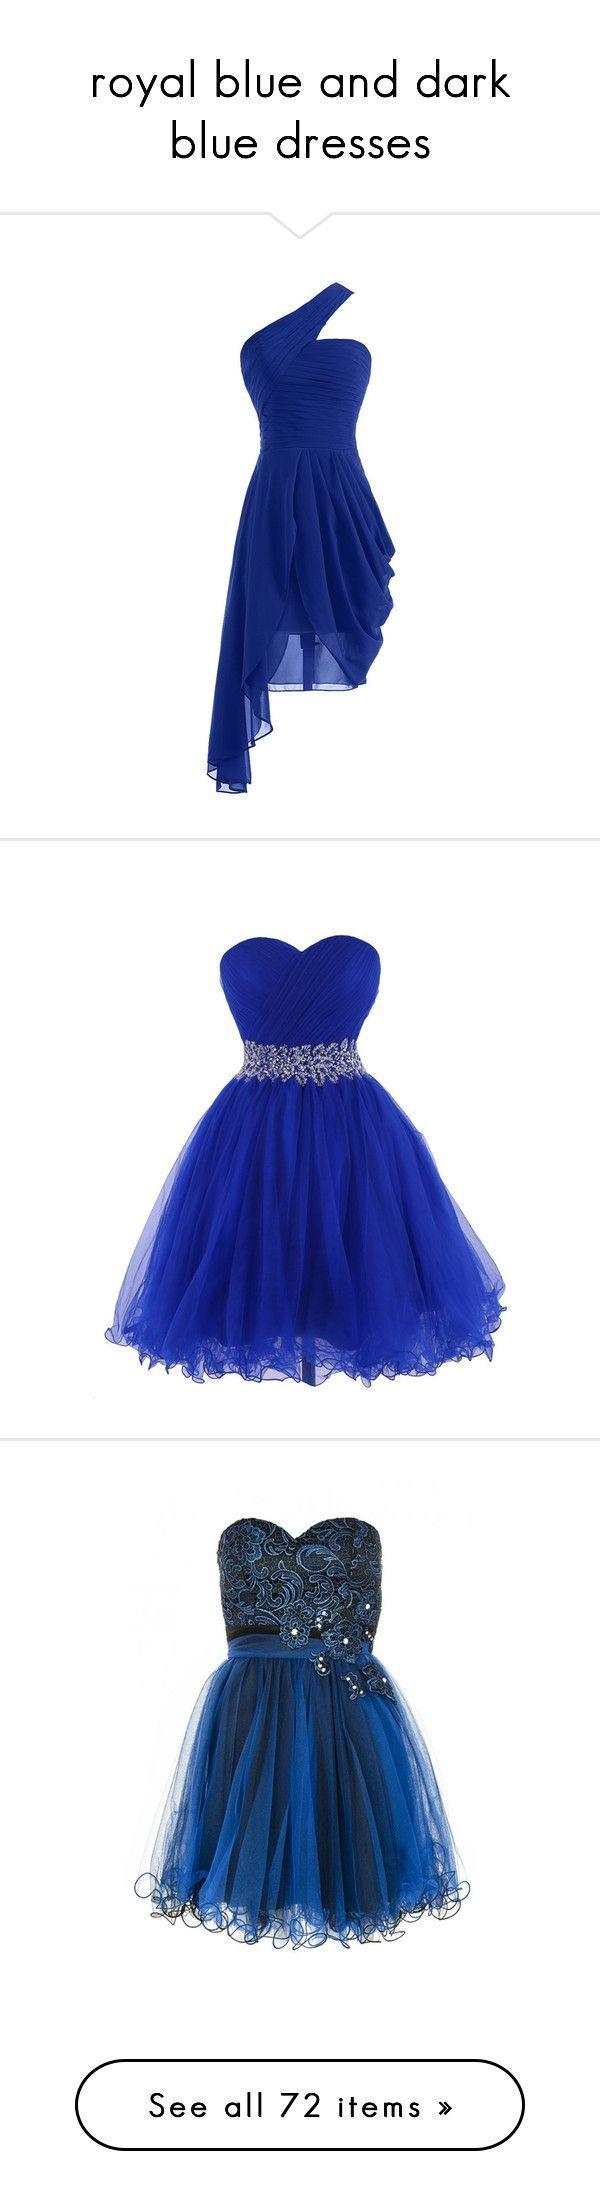 Royal blue and dark blue dresses